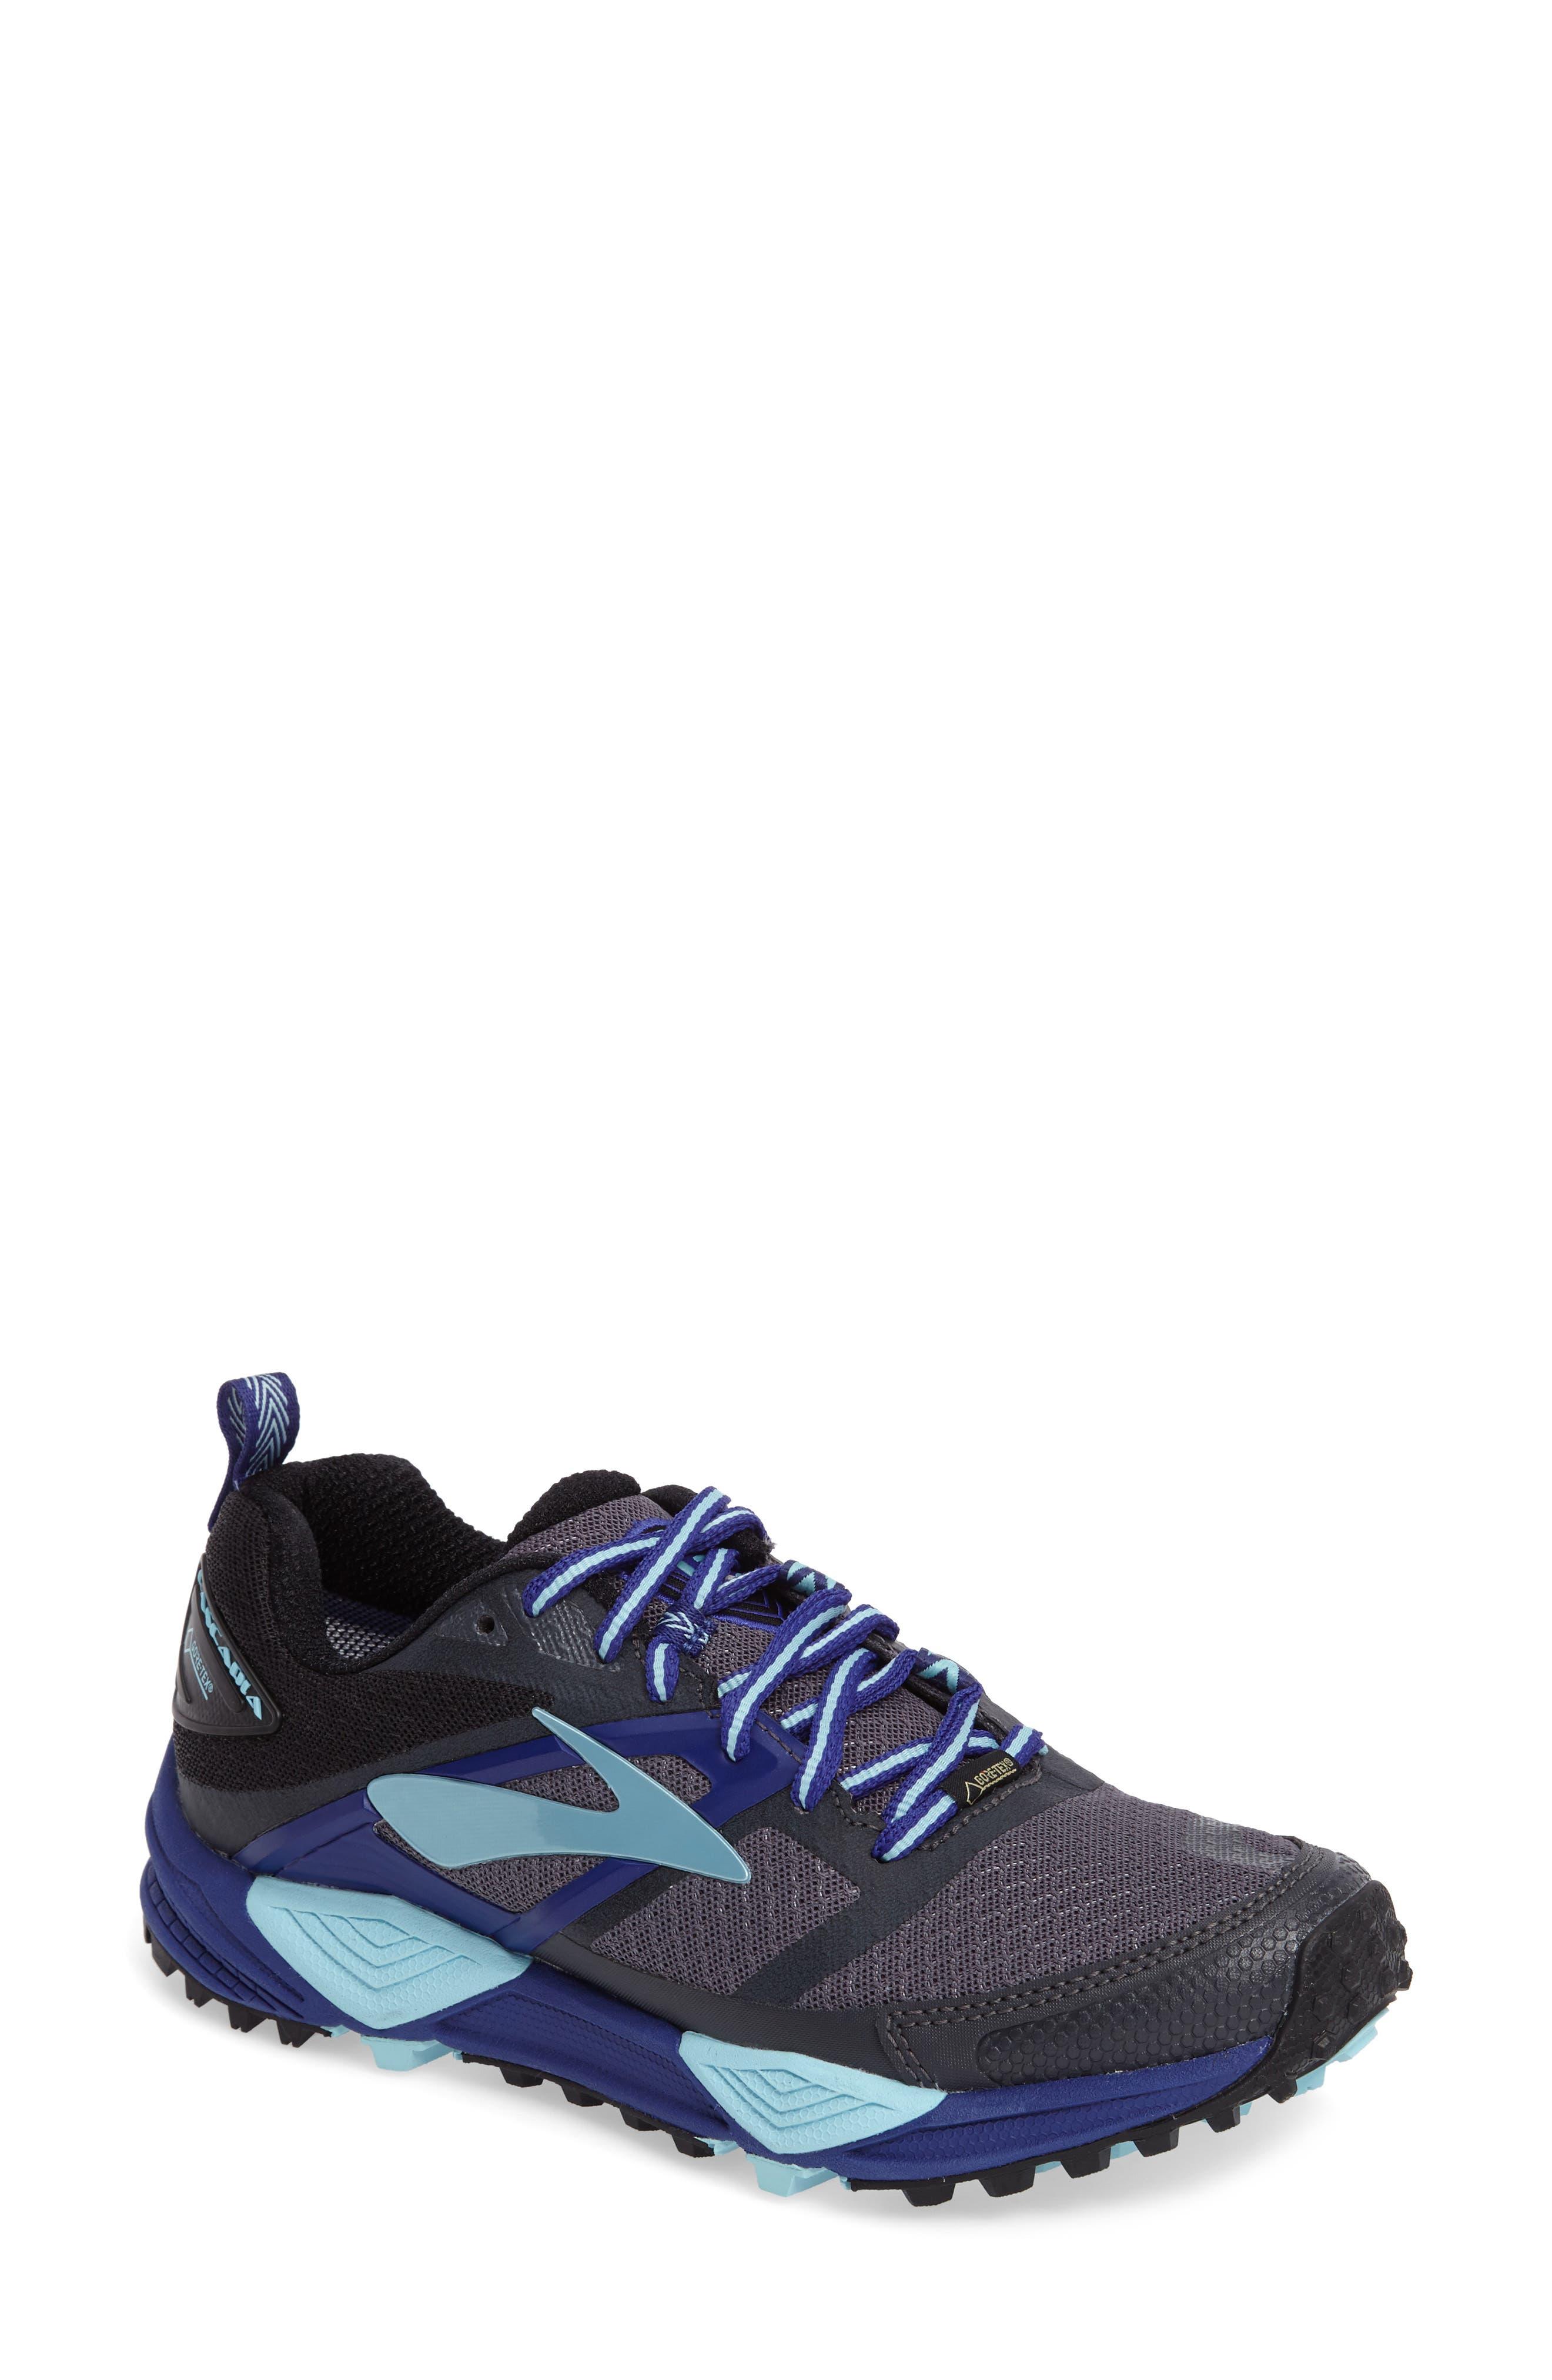 Alternate Image 1 Selected - Brooks Cascadia 12 GTX Trail Running Shoe (Women)